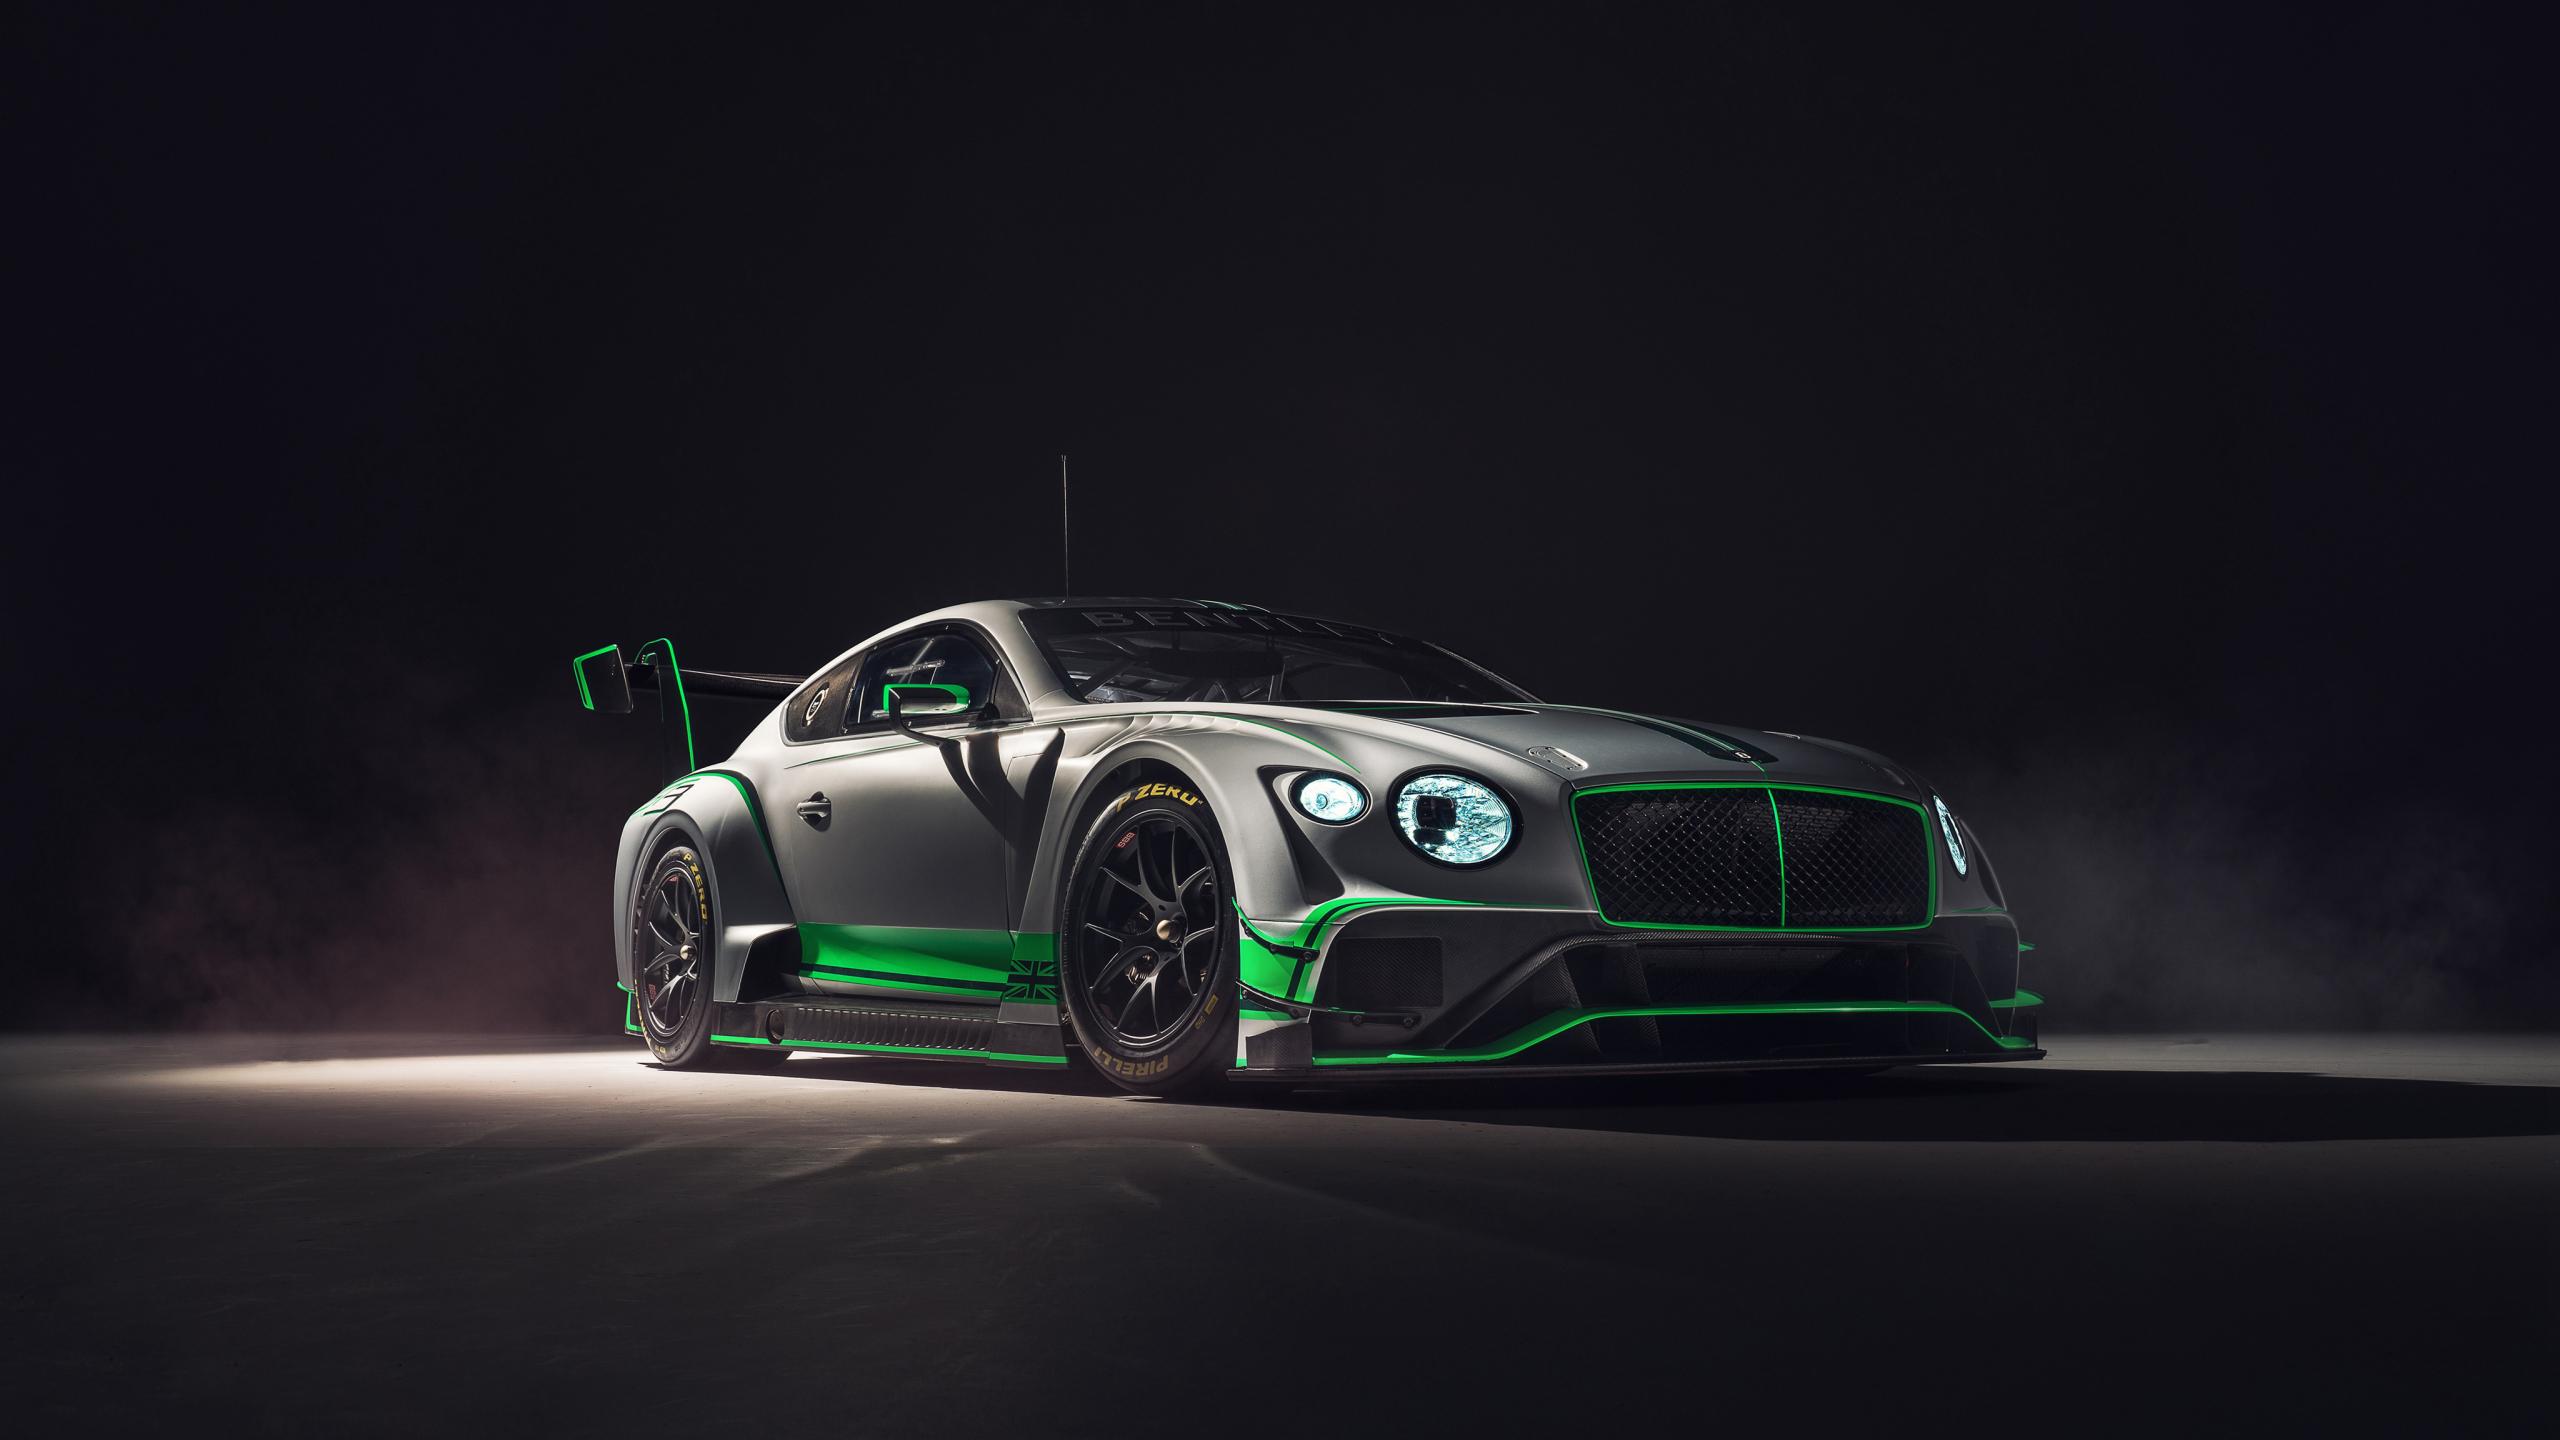 2018 Bentley Continental GT3, 2018 luxury car, 2560x1440 wallpaper